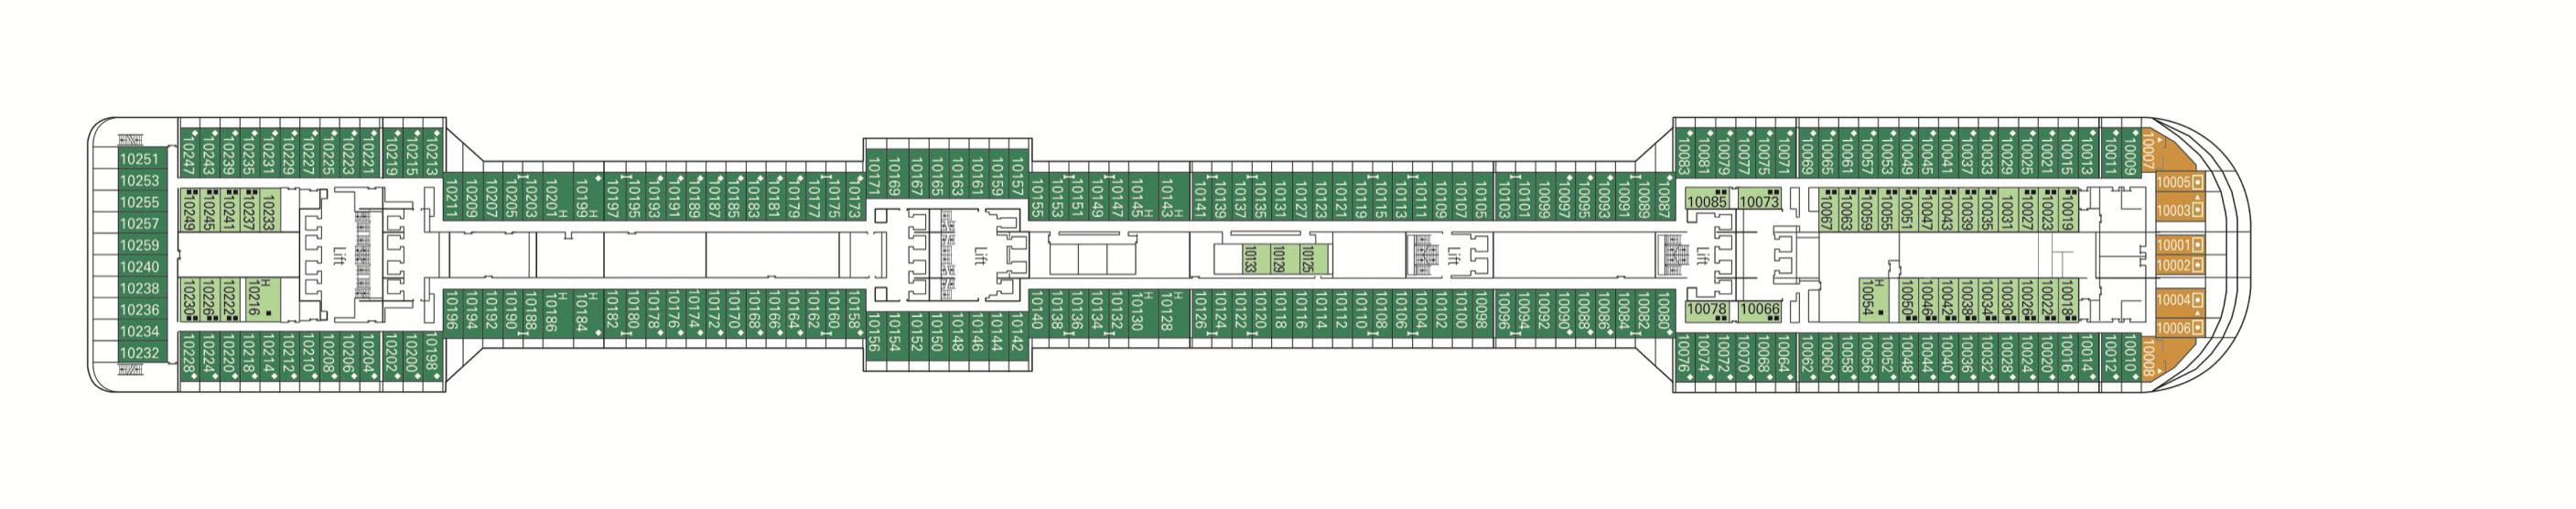 MSC Fantasia Class Splendida Deck 10.jpg